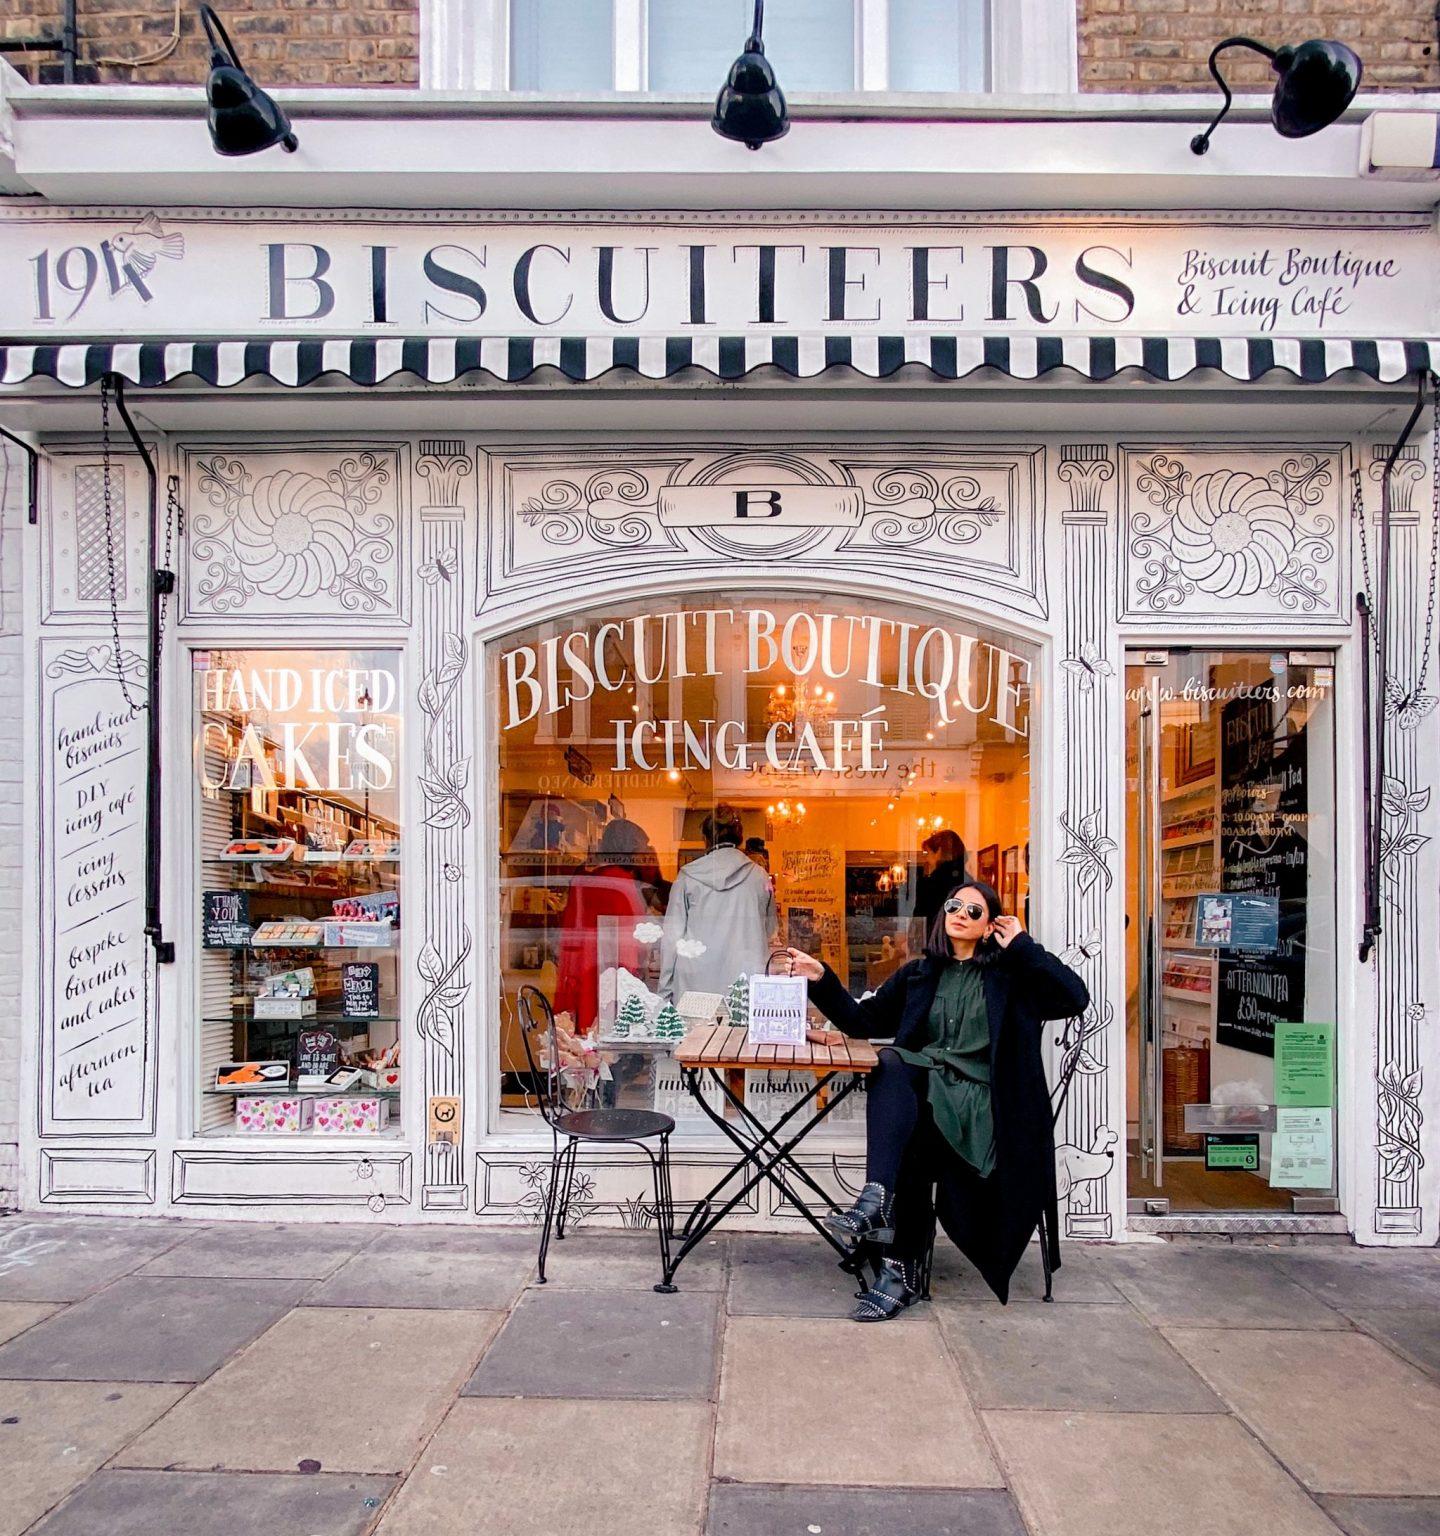 Biscuiteers Icing cafe review